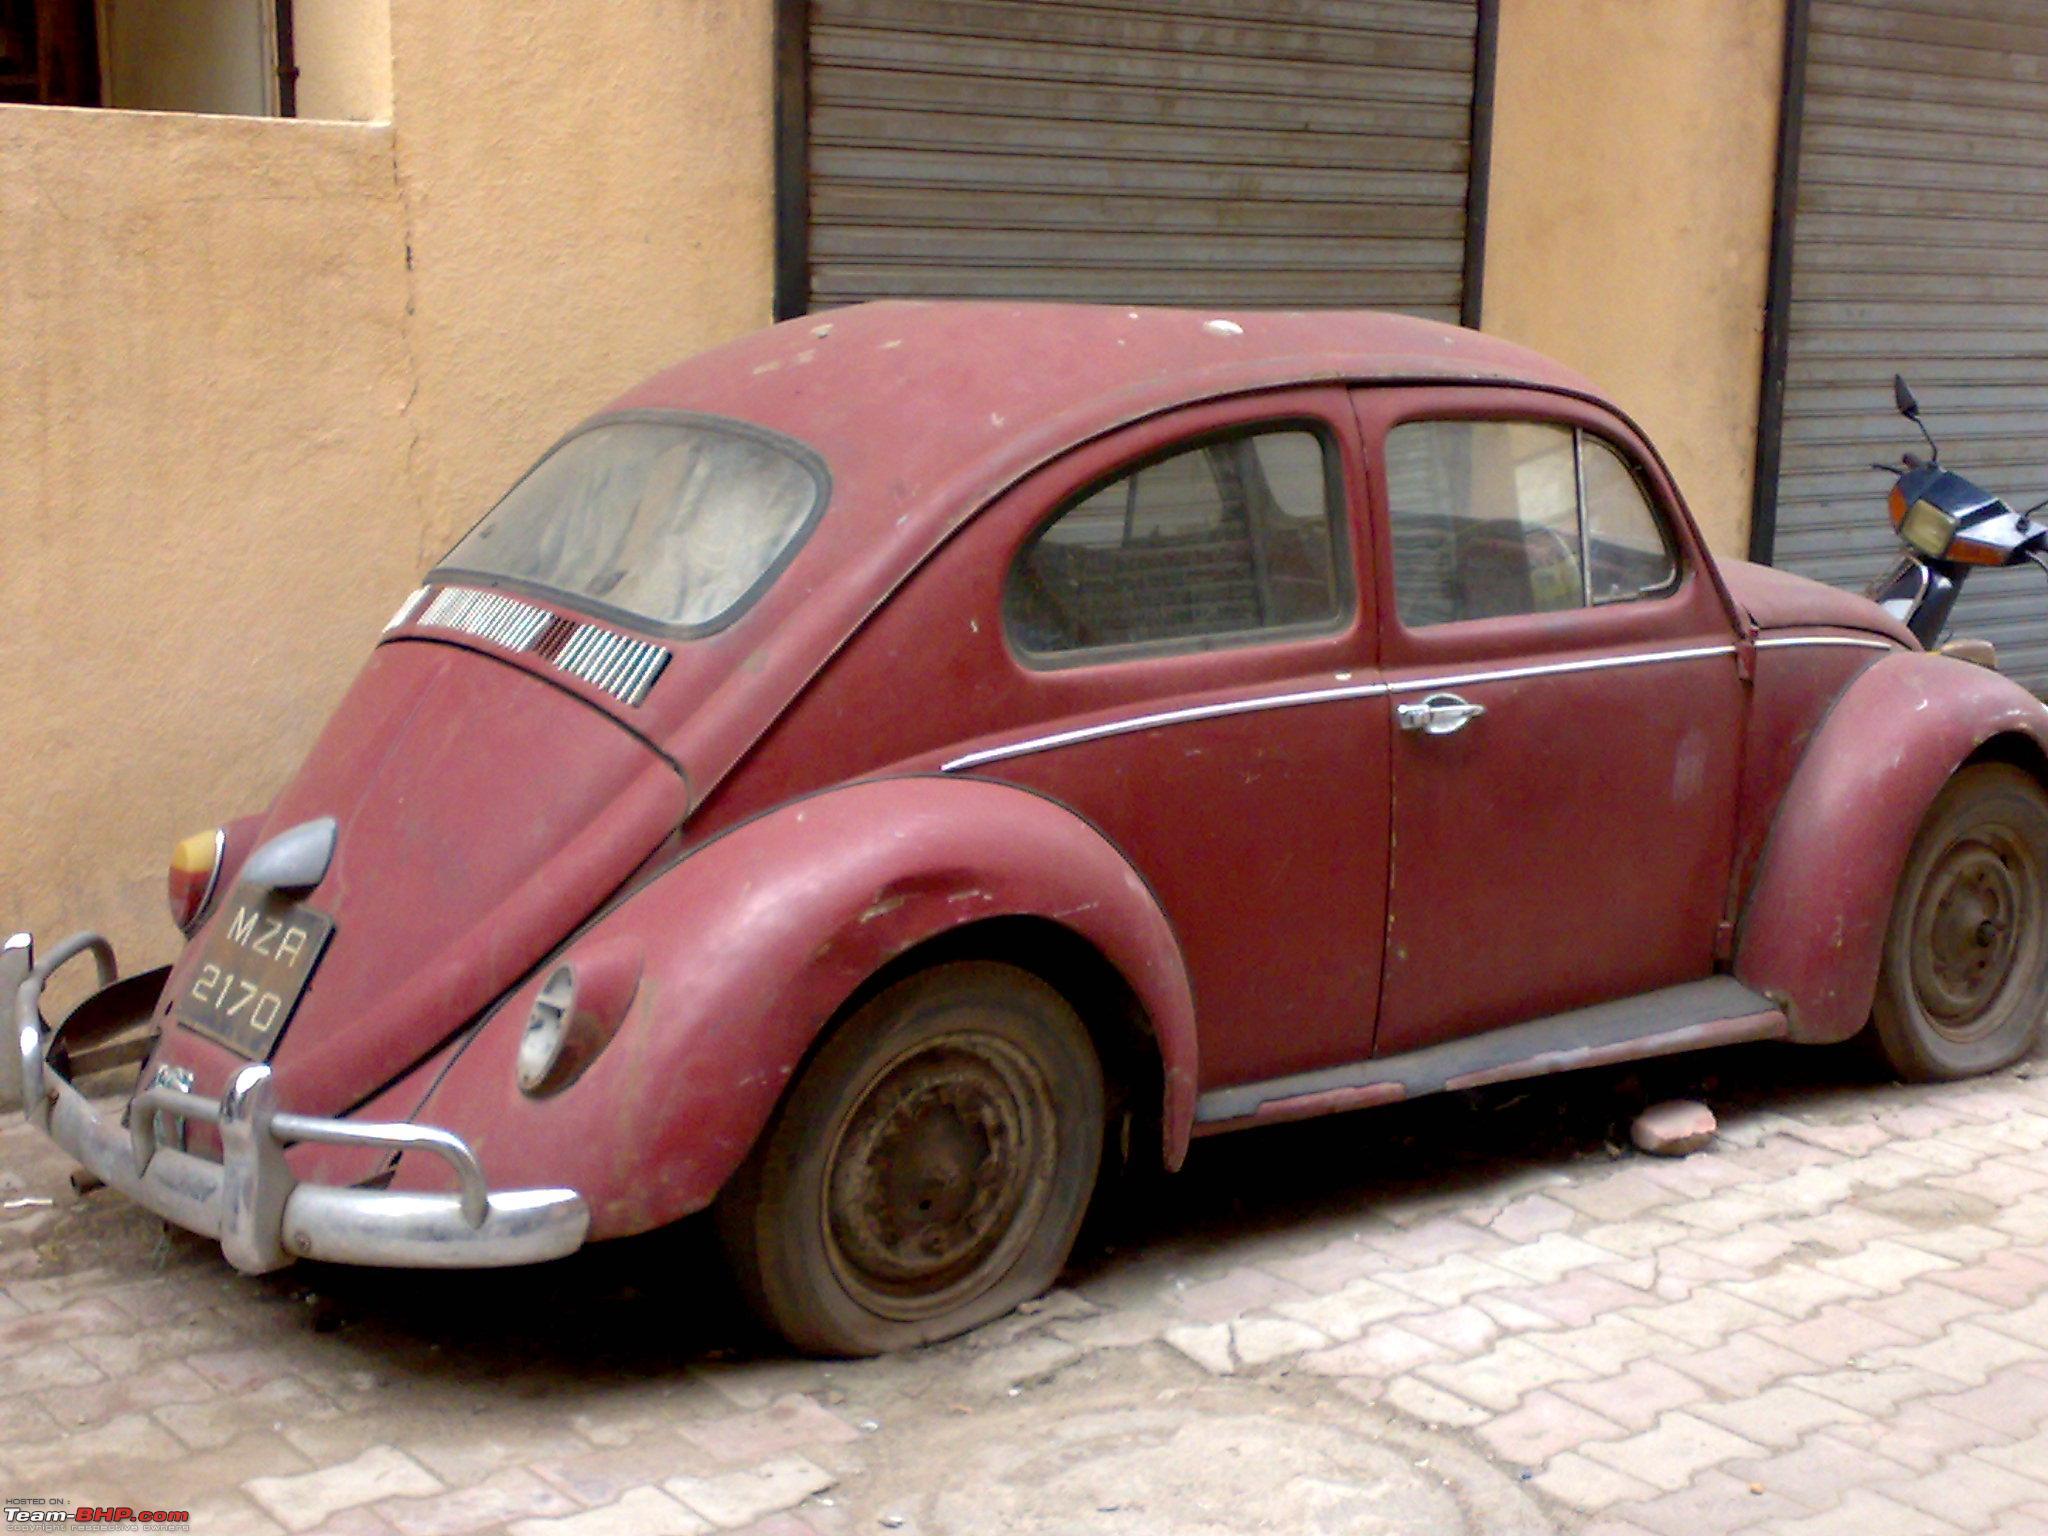 Volk Wagon Volkswagen Old Cars In India